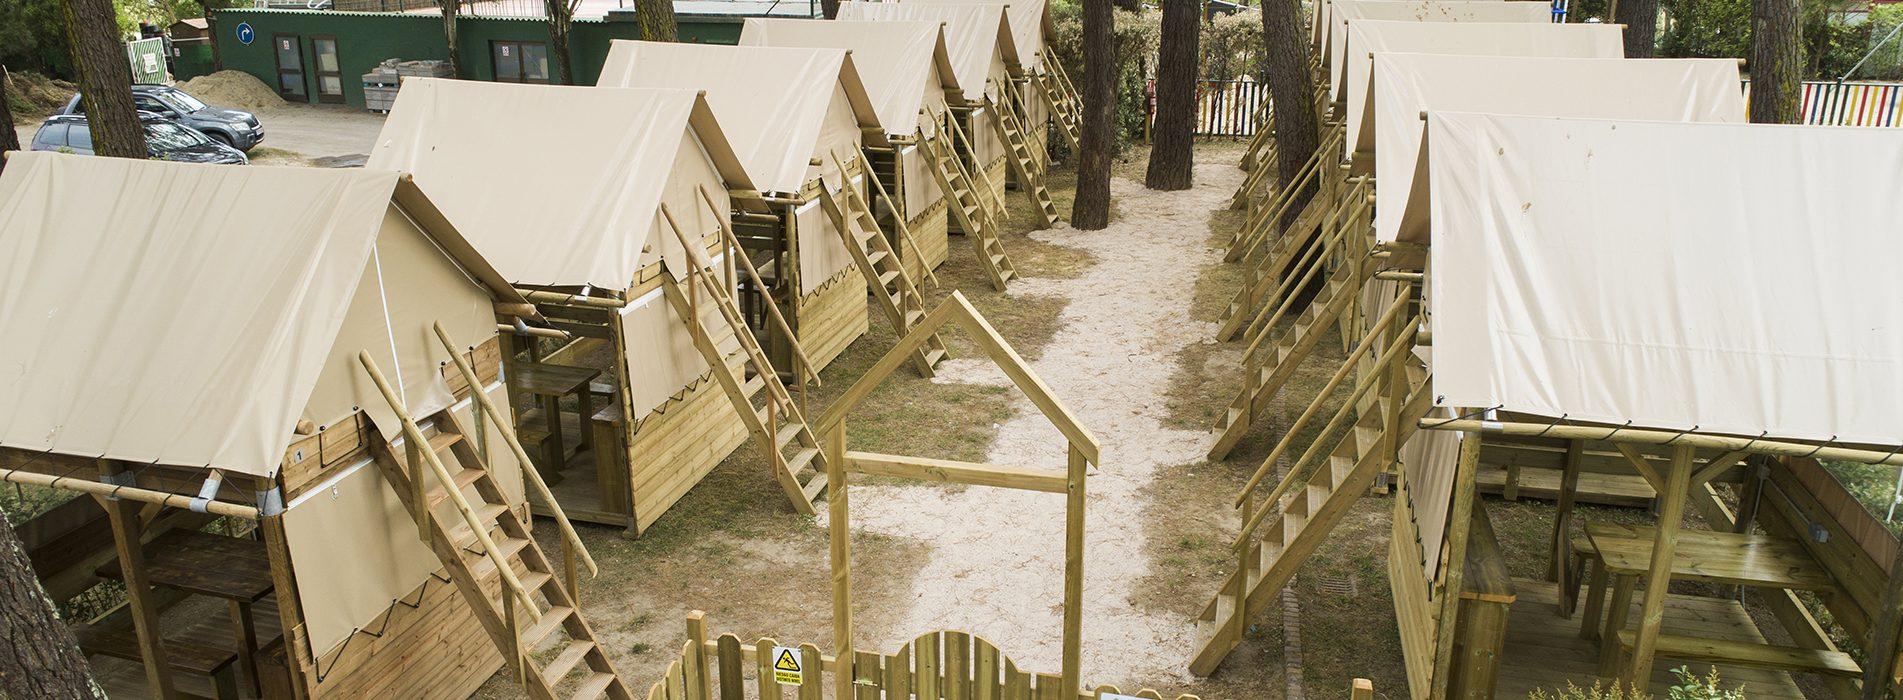 Camping Baiona 00005_redimensionado